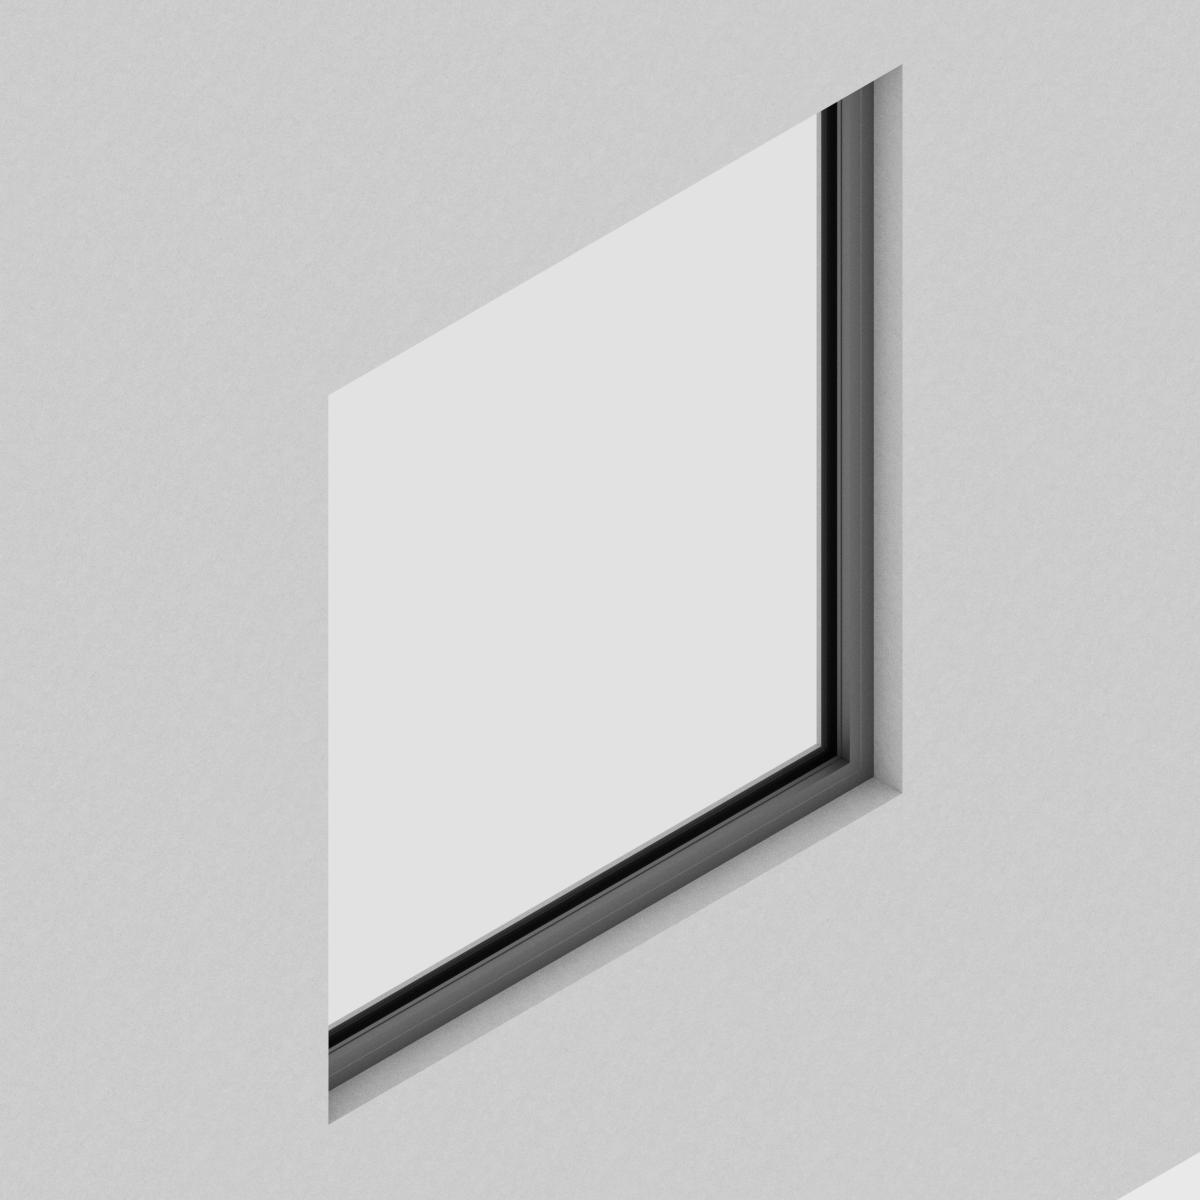 Ventana Fija QT de perfil de Aluminio con RPT